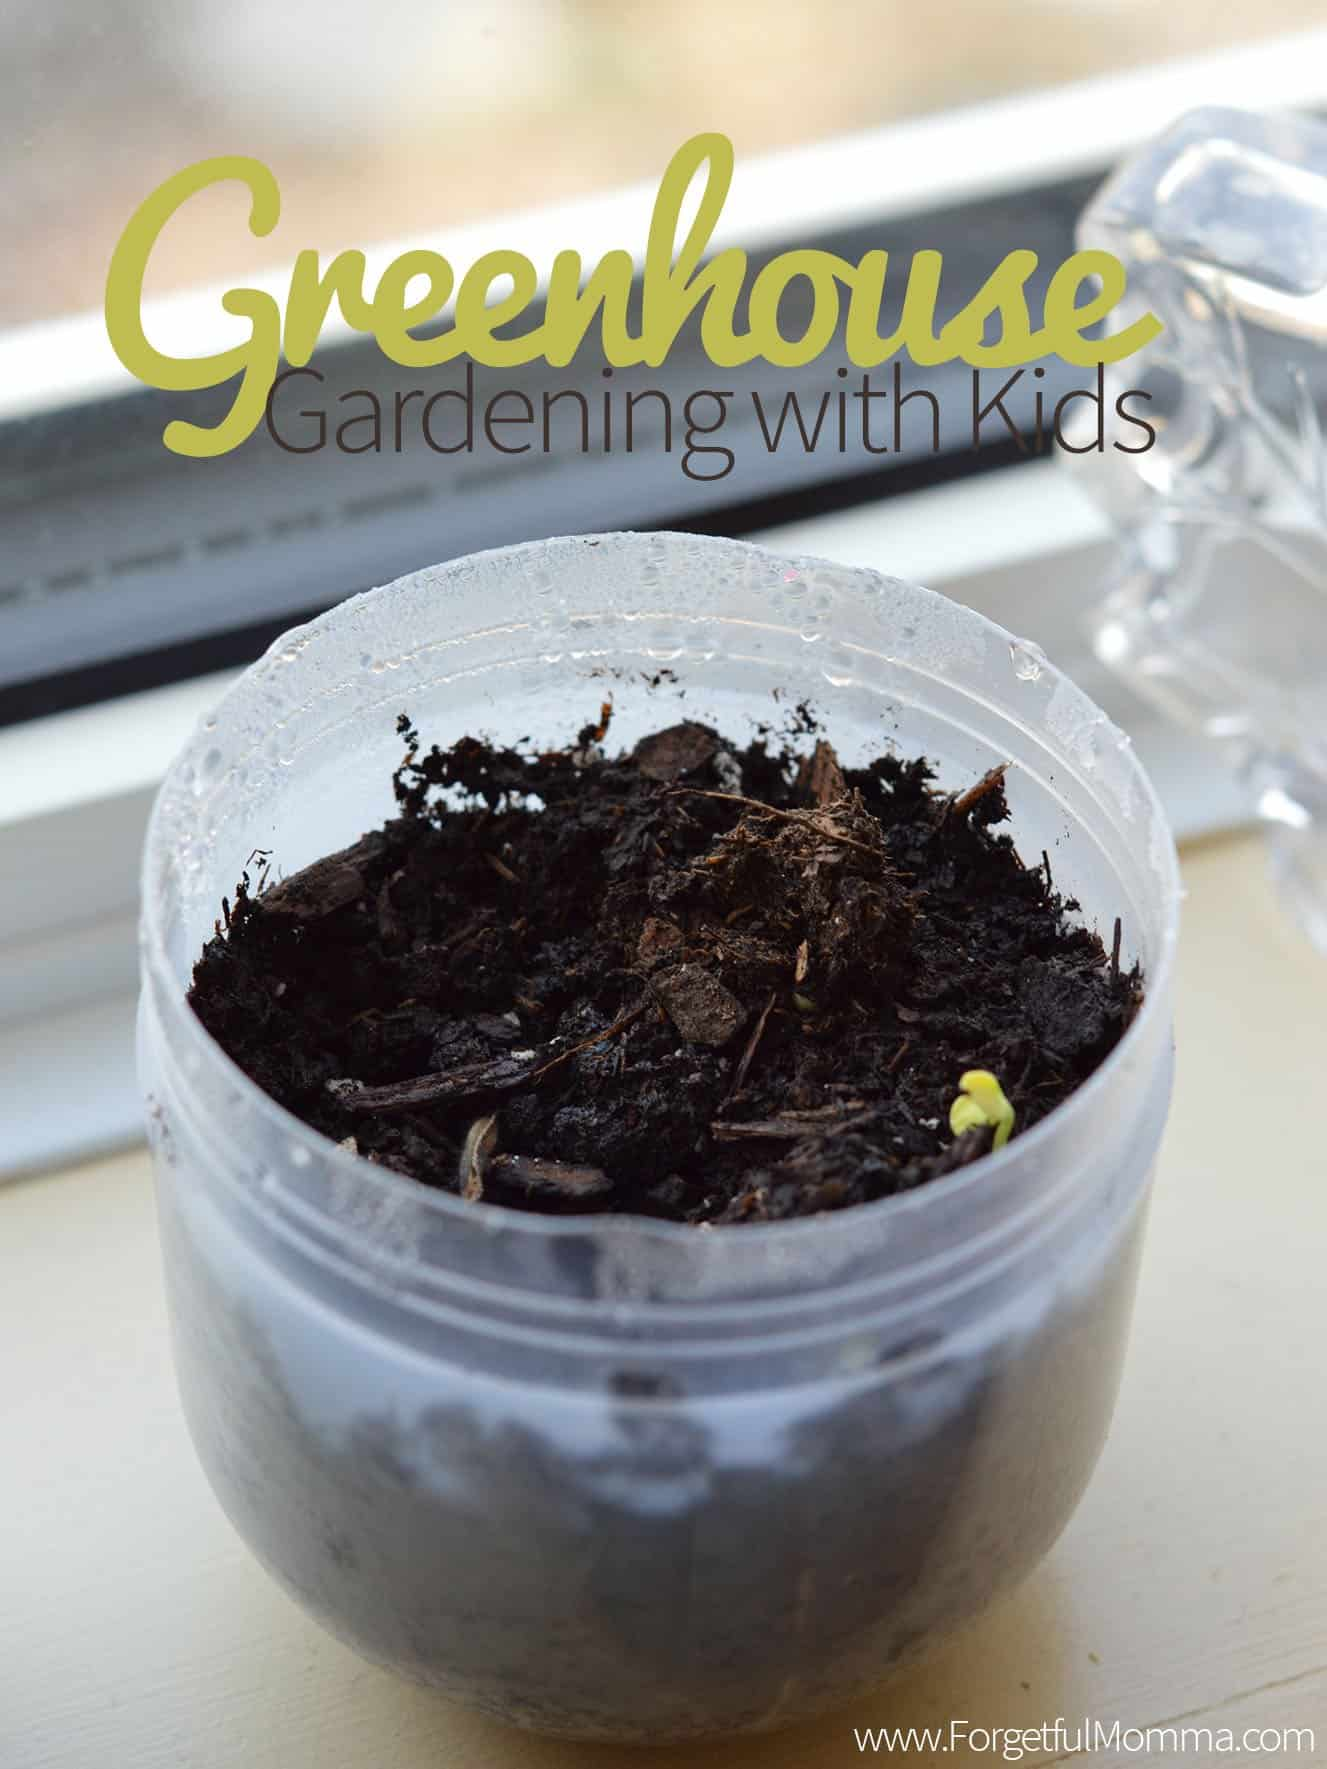 Greenhouse Gardening with Kids